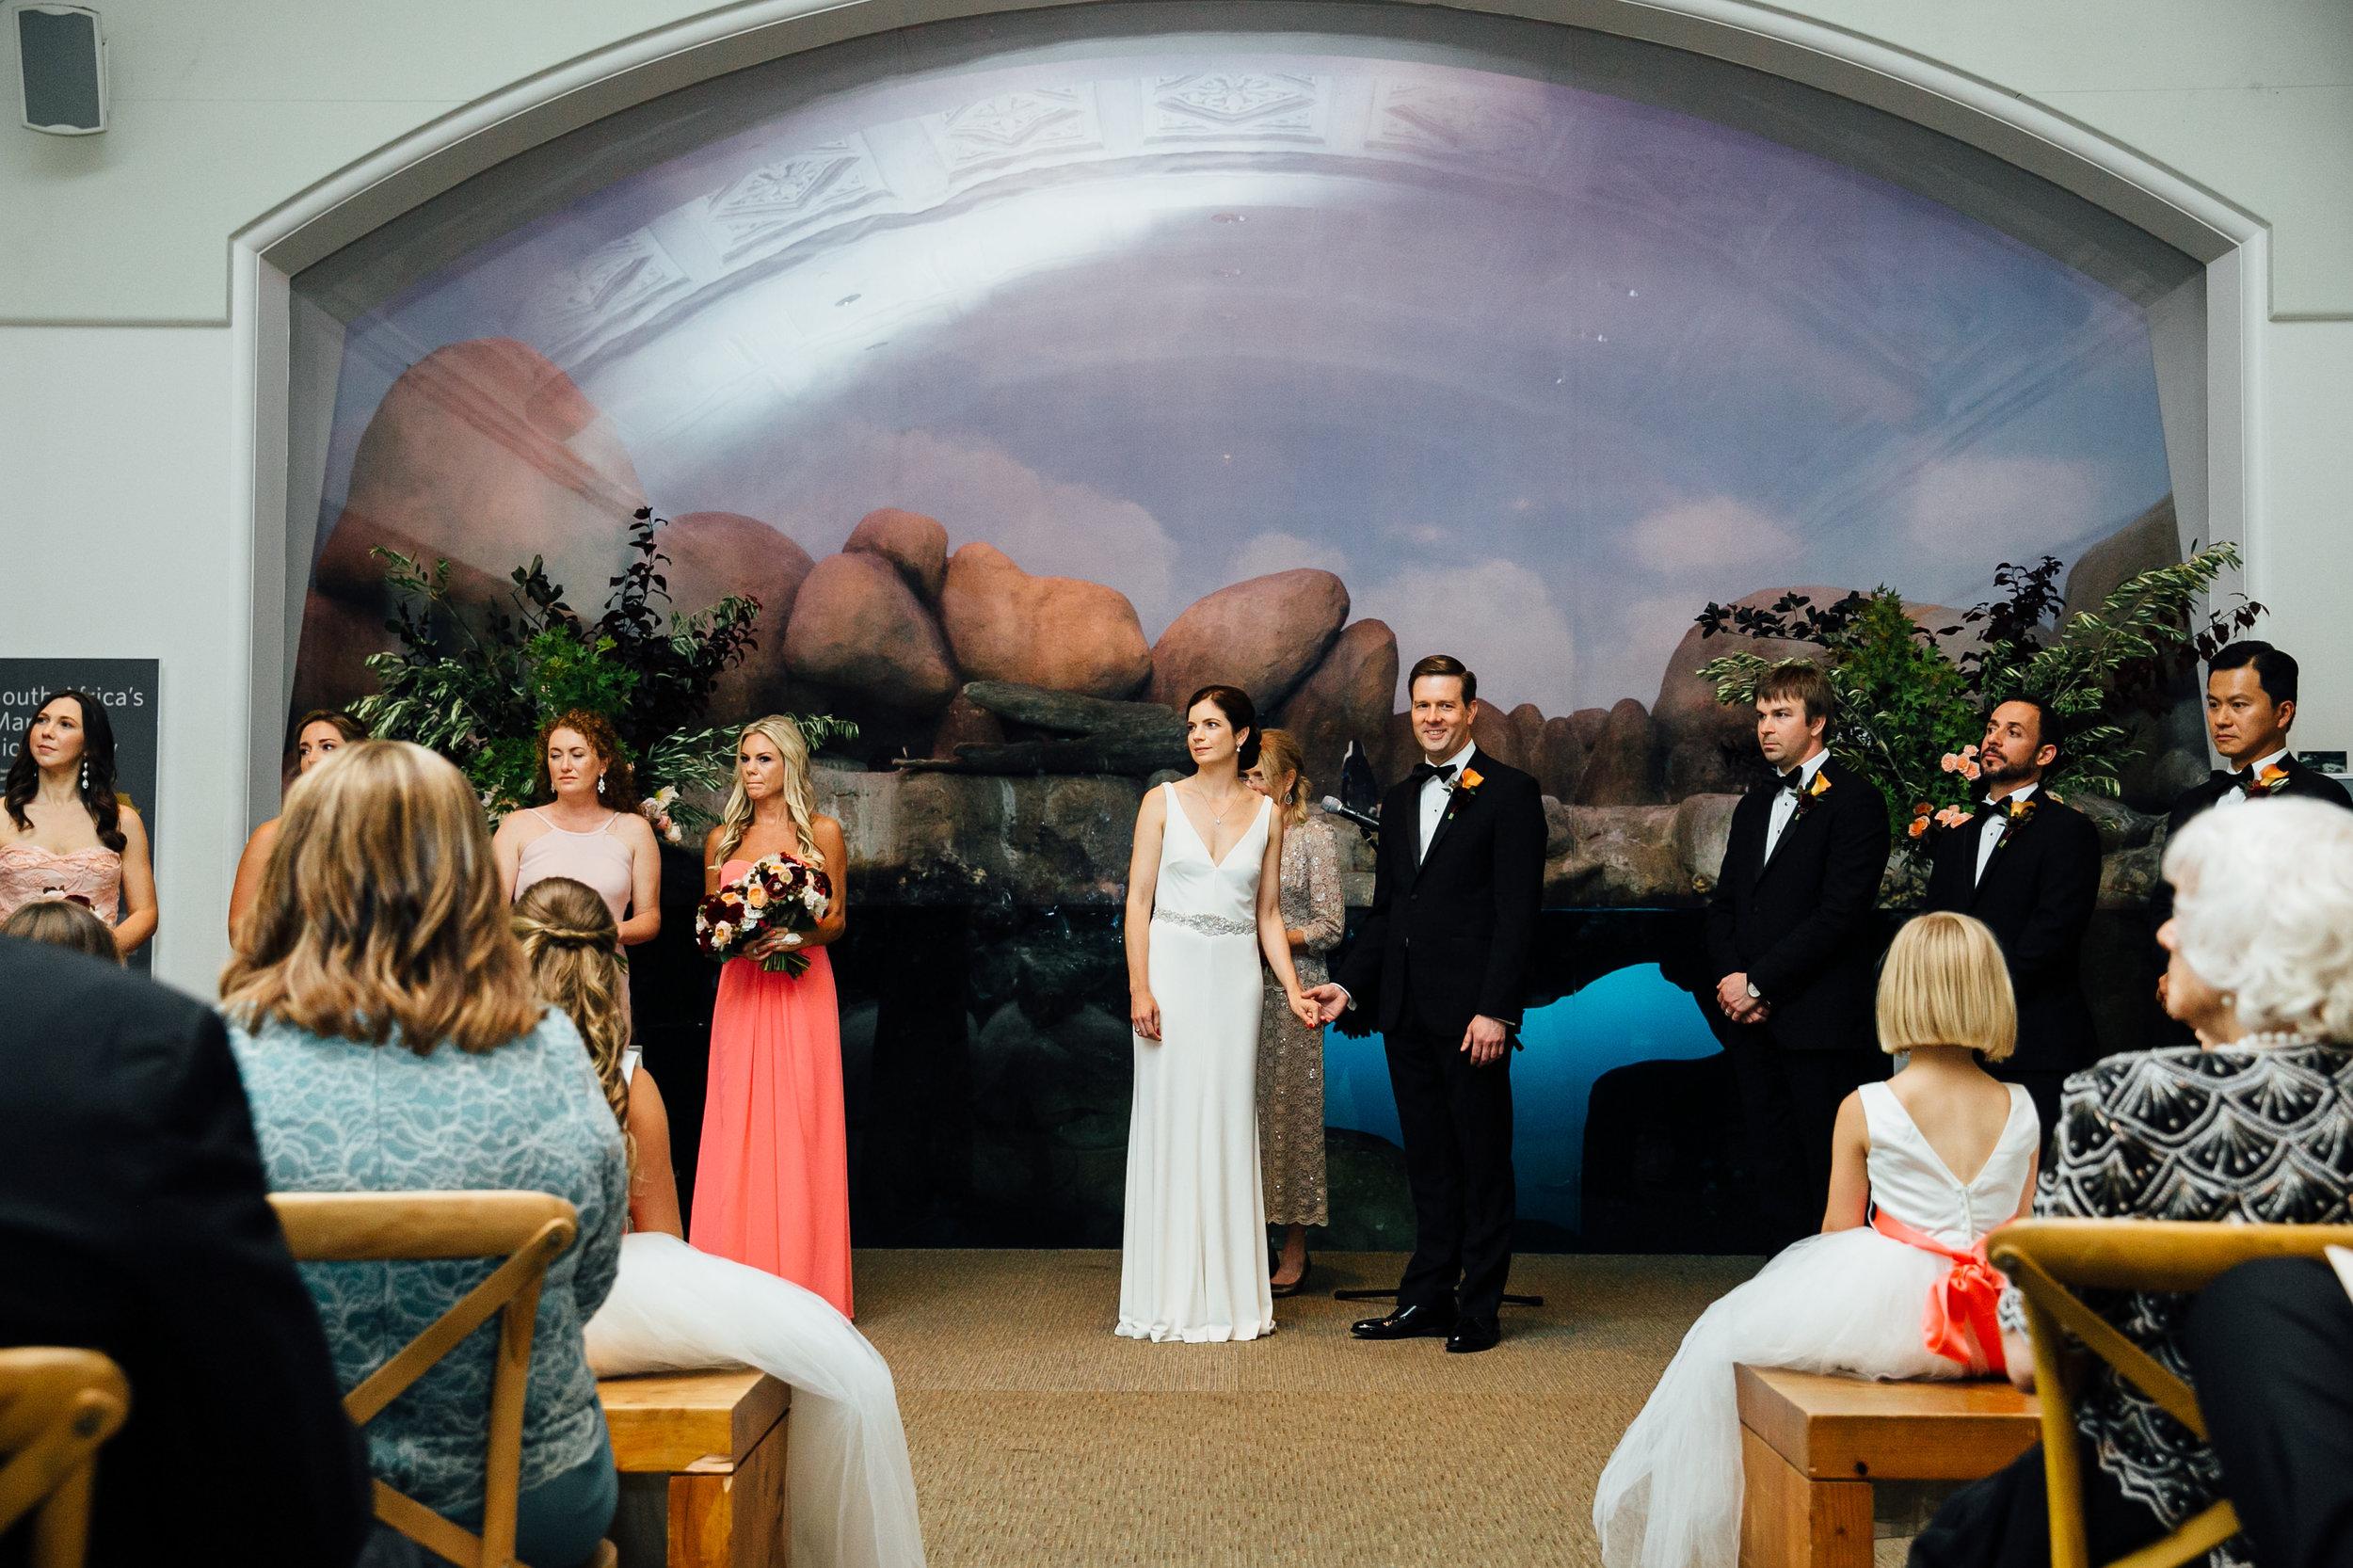 Wedding_KathleenMichael_Ceremony-179.jpg